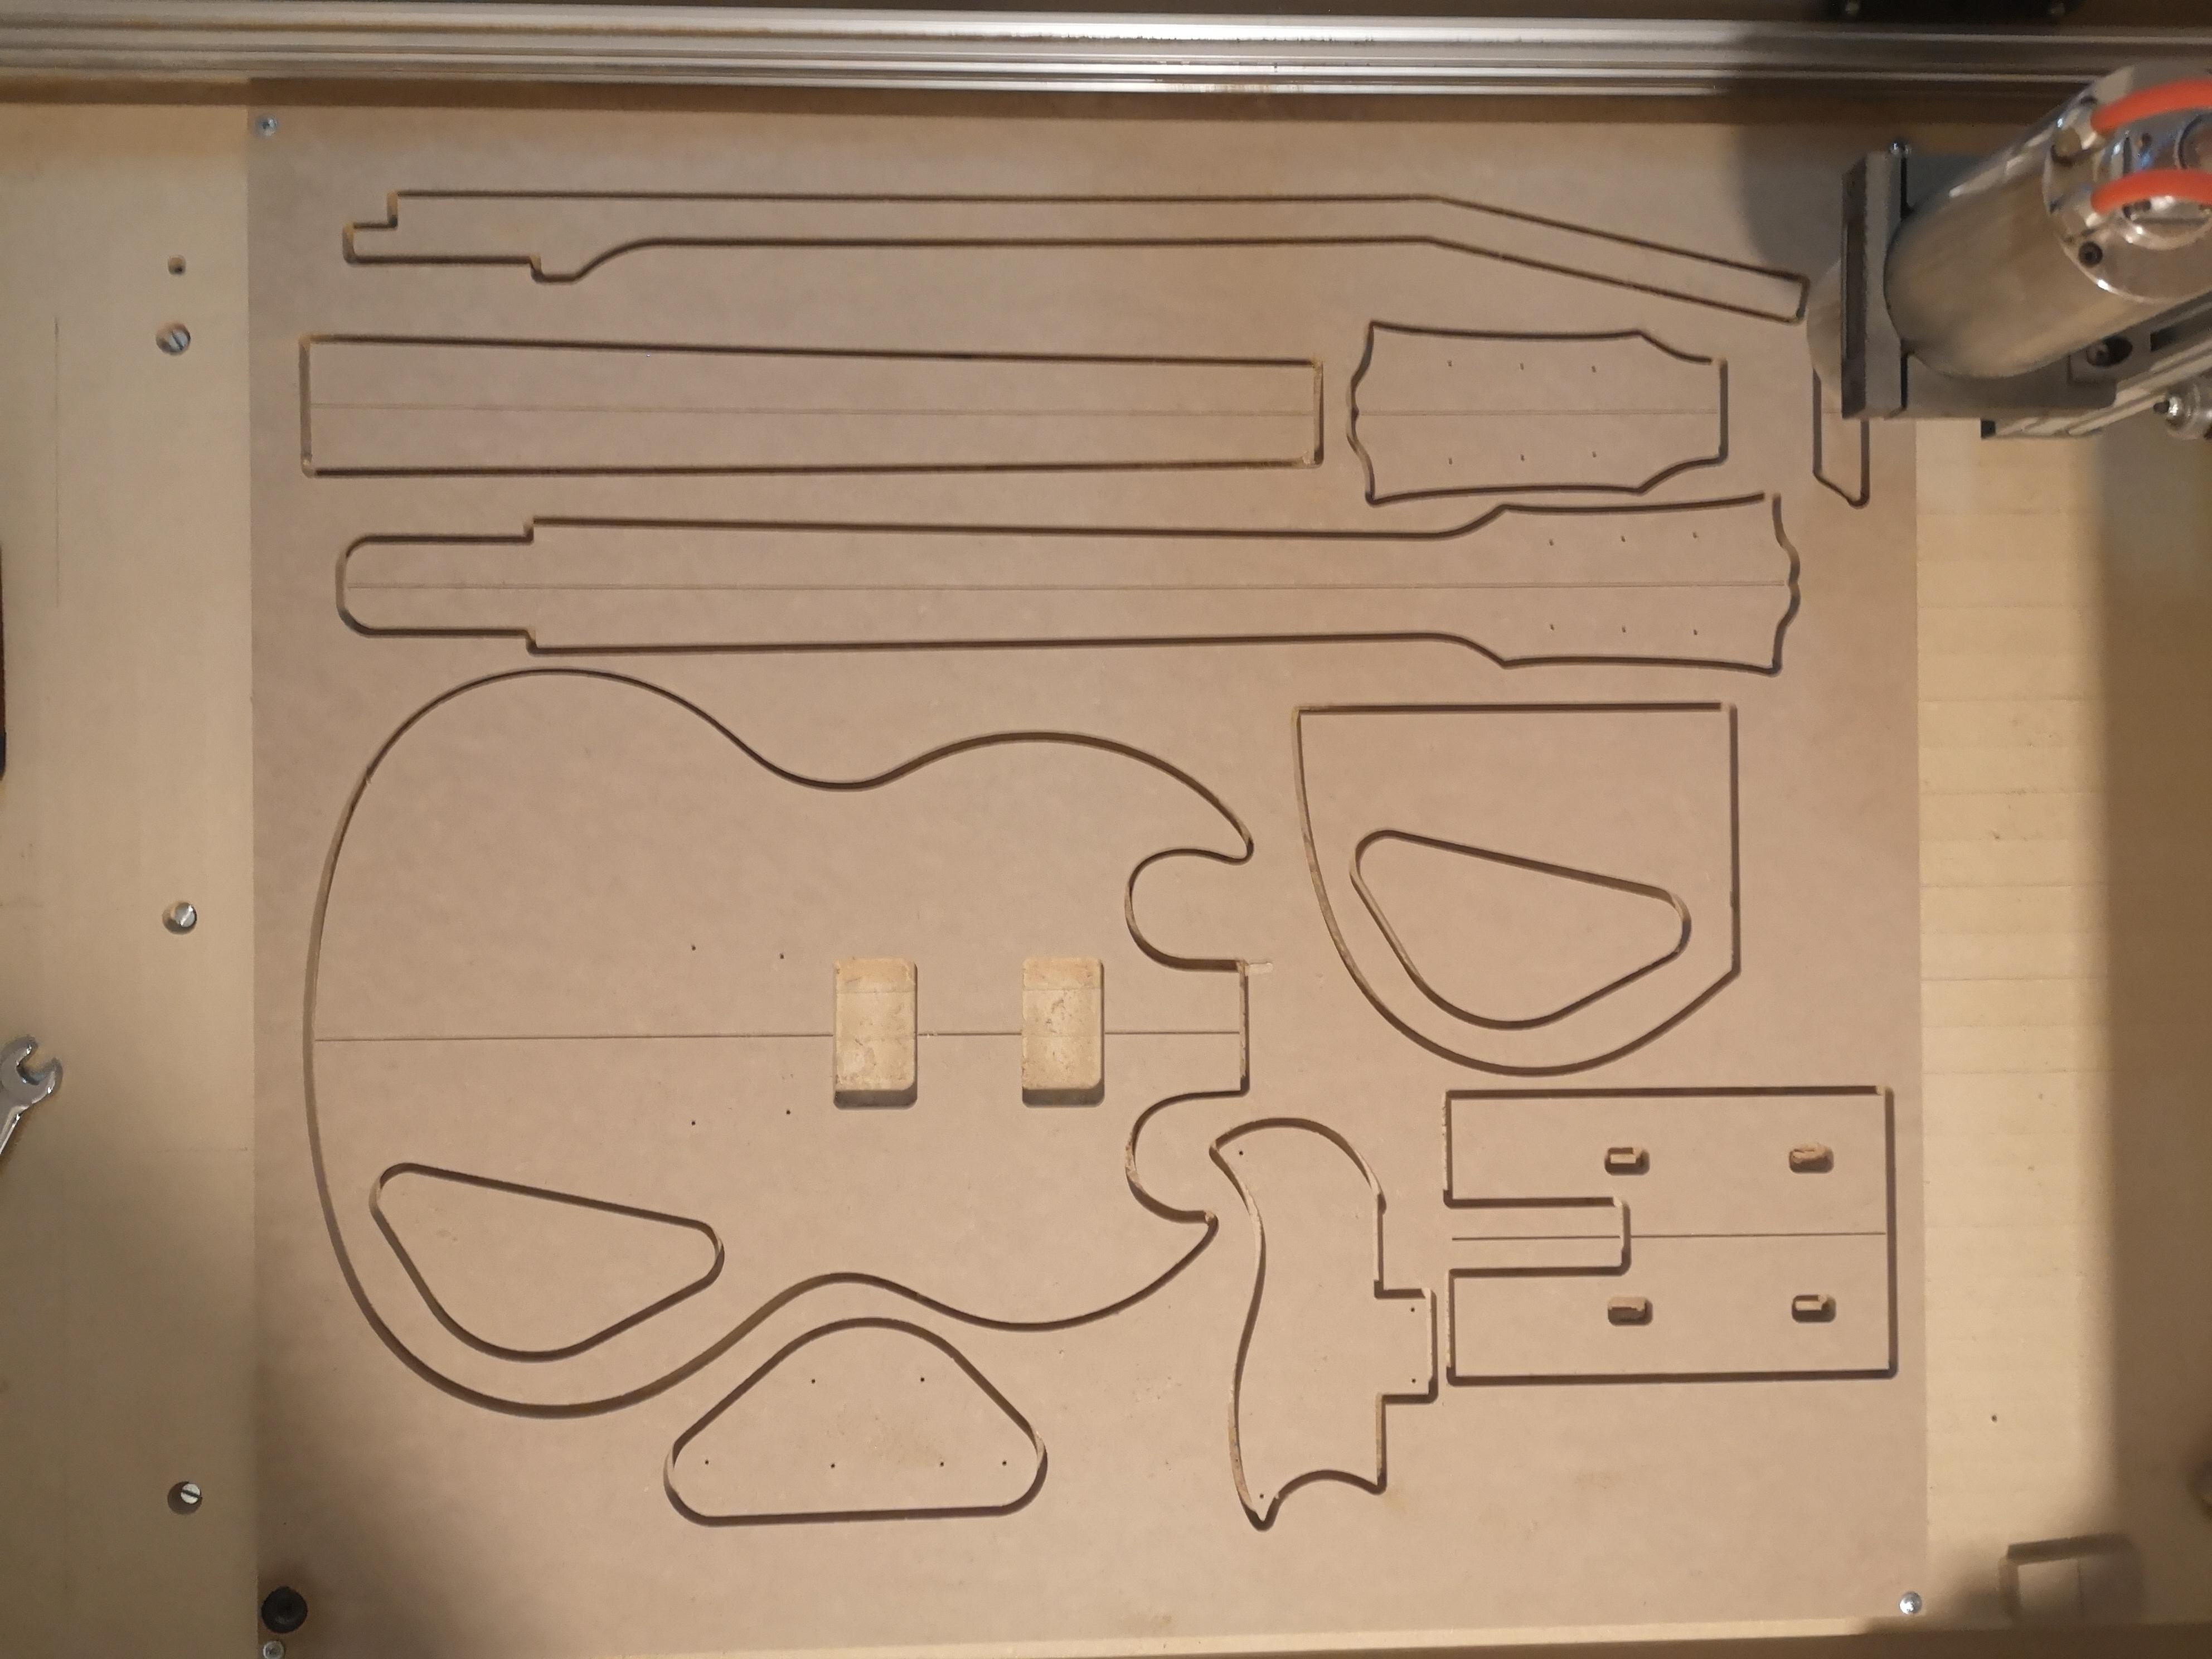 04-Gibson-SG-off-the-cnc.jpg